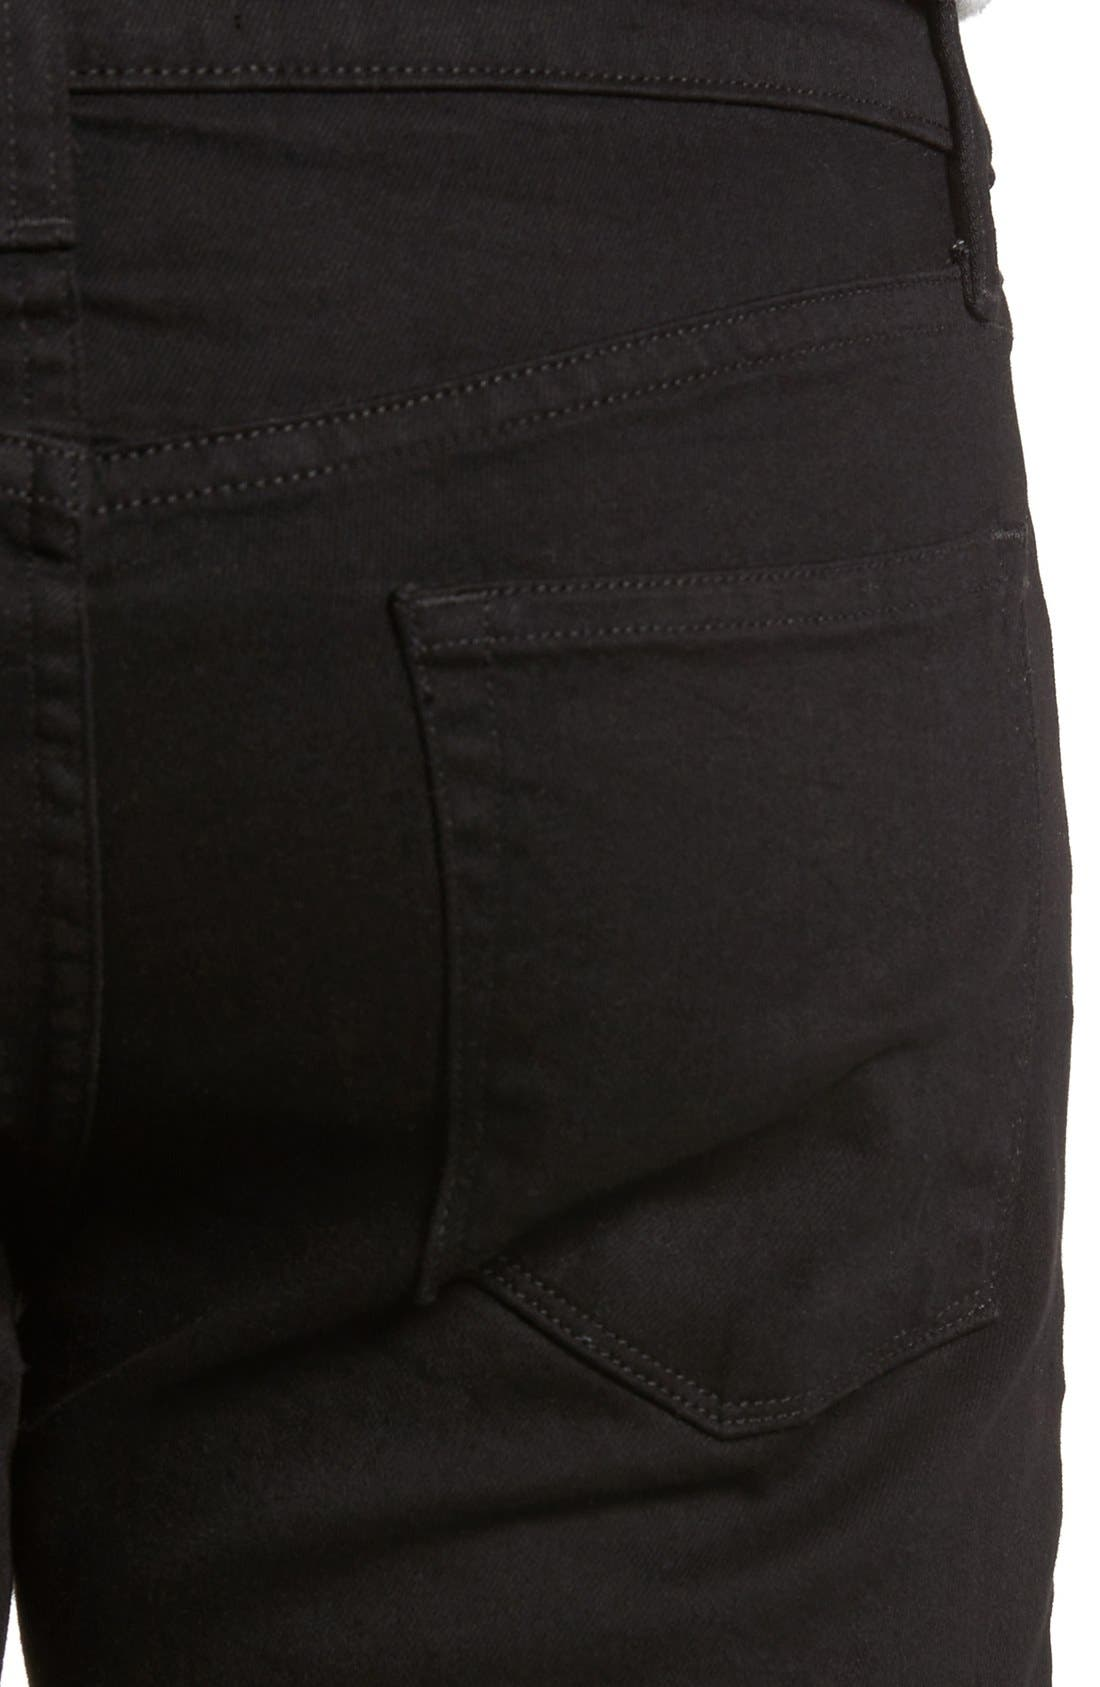 J BRAND, Tyler Slim Fit Jeans, Alternate thumbnail 7, color, TRIVOR BLACK